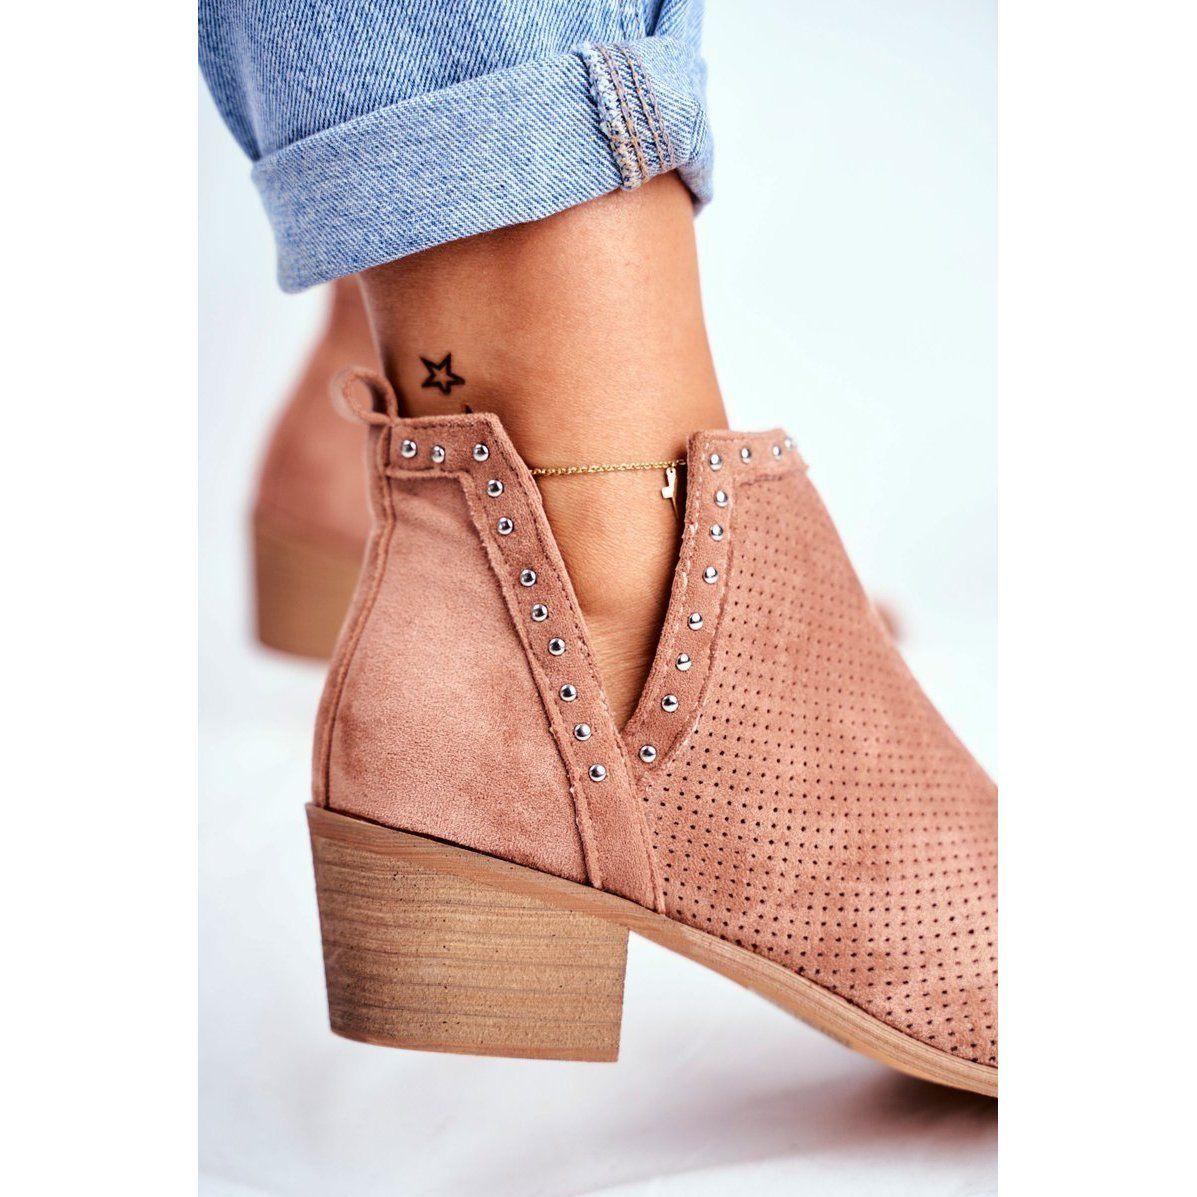 Bellucci Botki Damskie Na Slupku Zamszowe Azurowe Rozowe Margate Fashion Shoes Heeled Mules